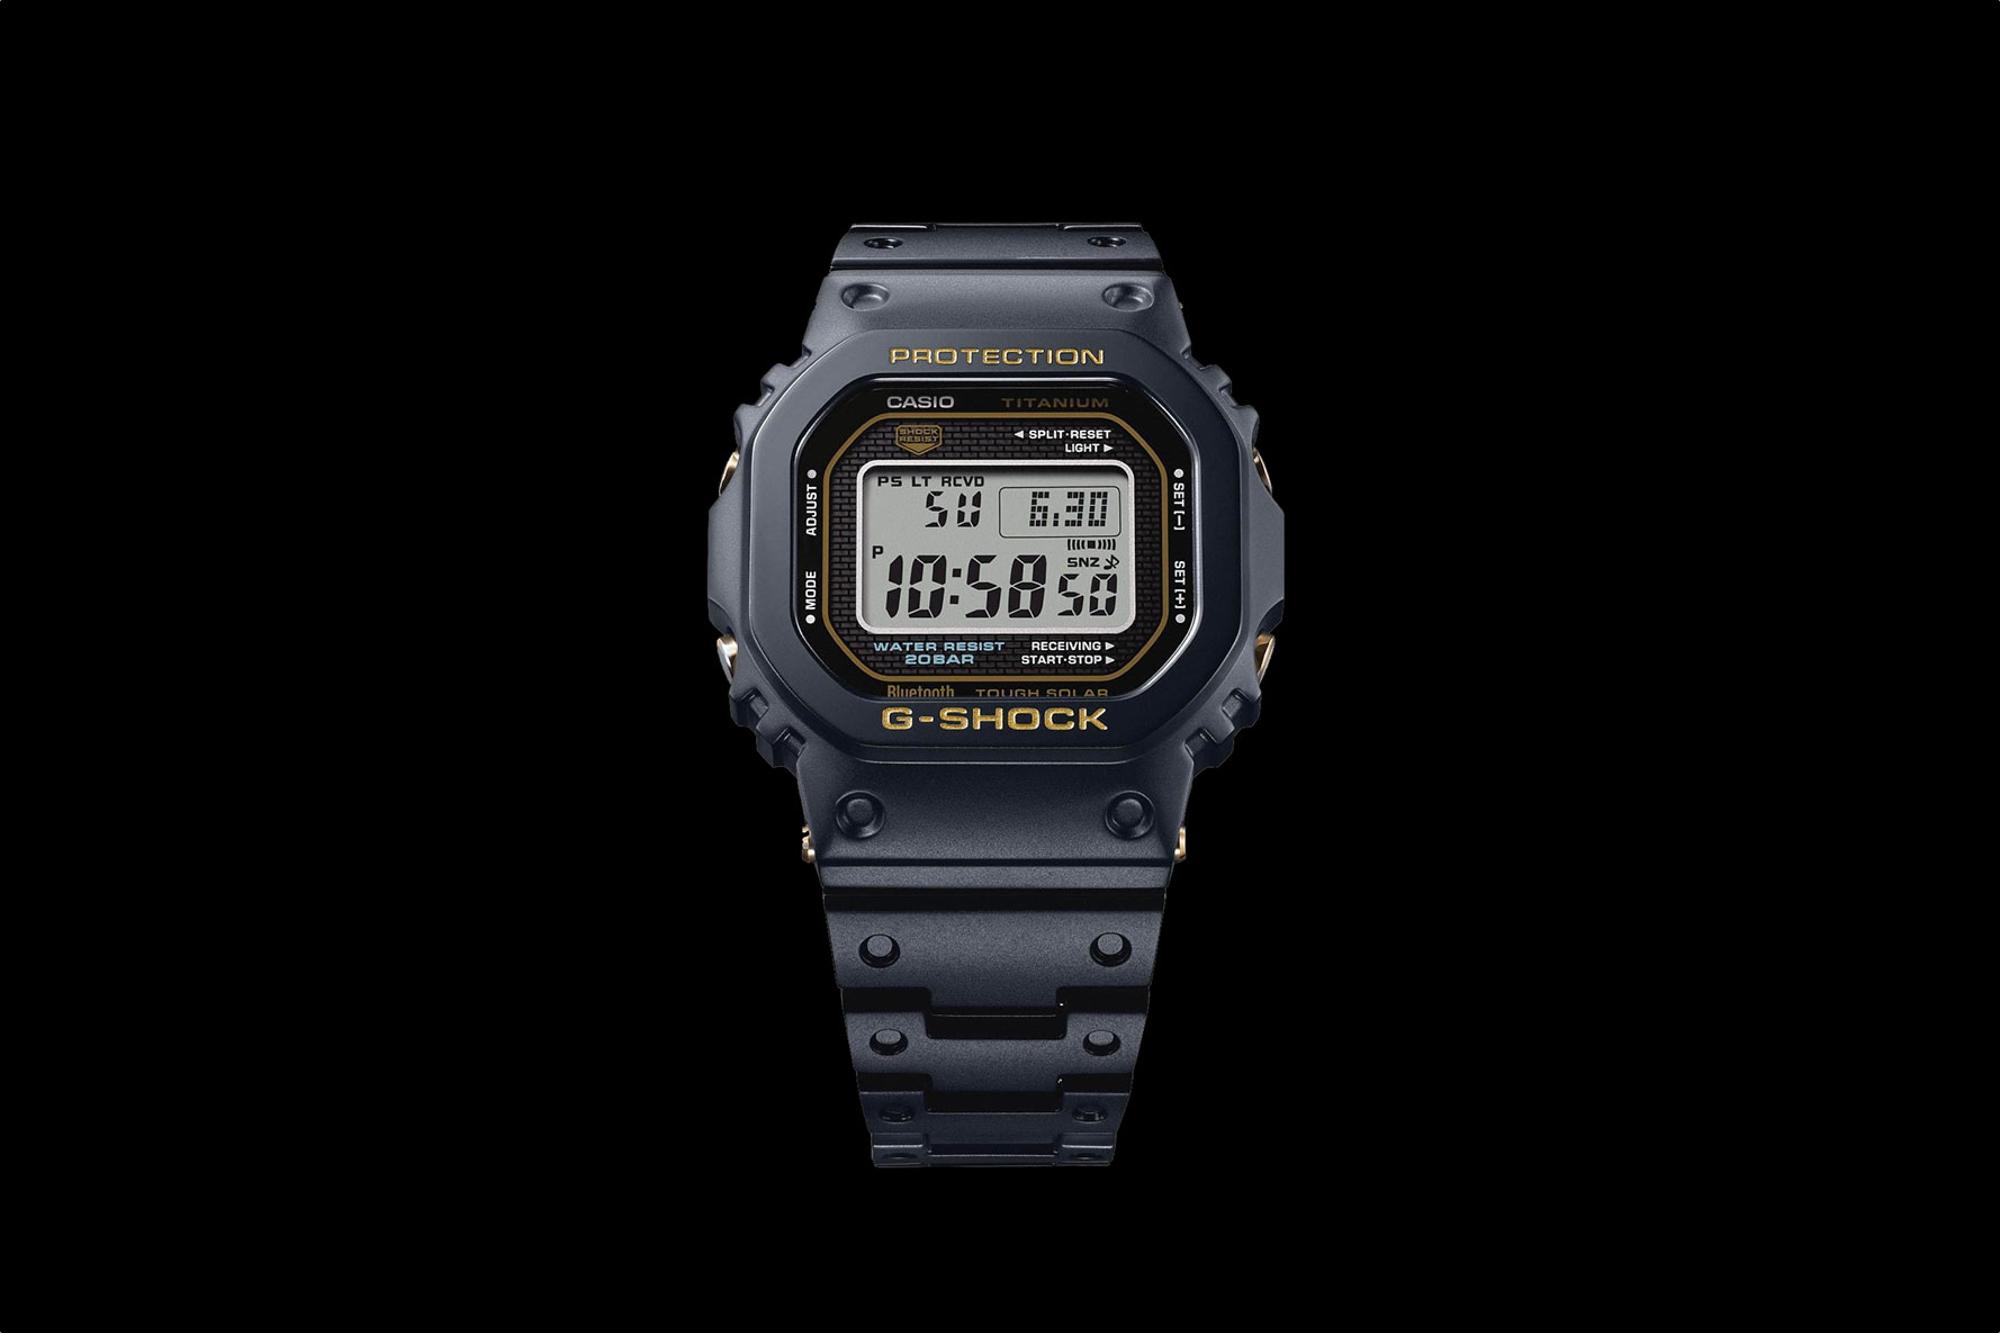 Titanium G-Shock 5000 Series GMW-B5000TB